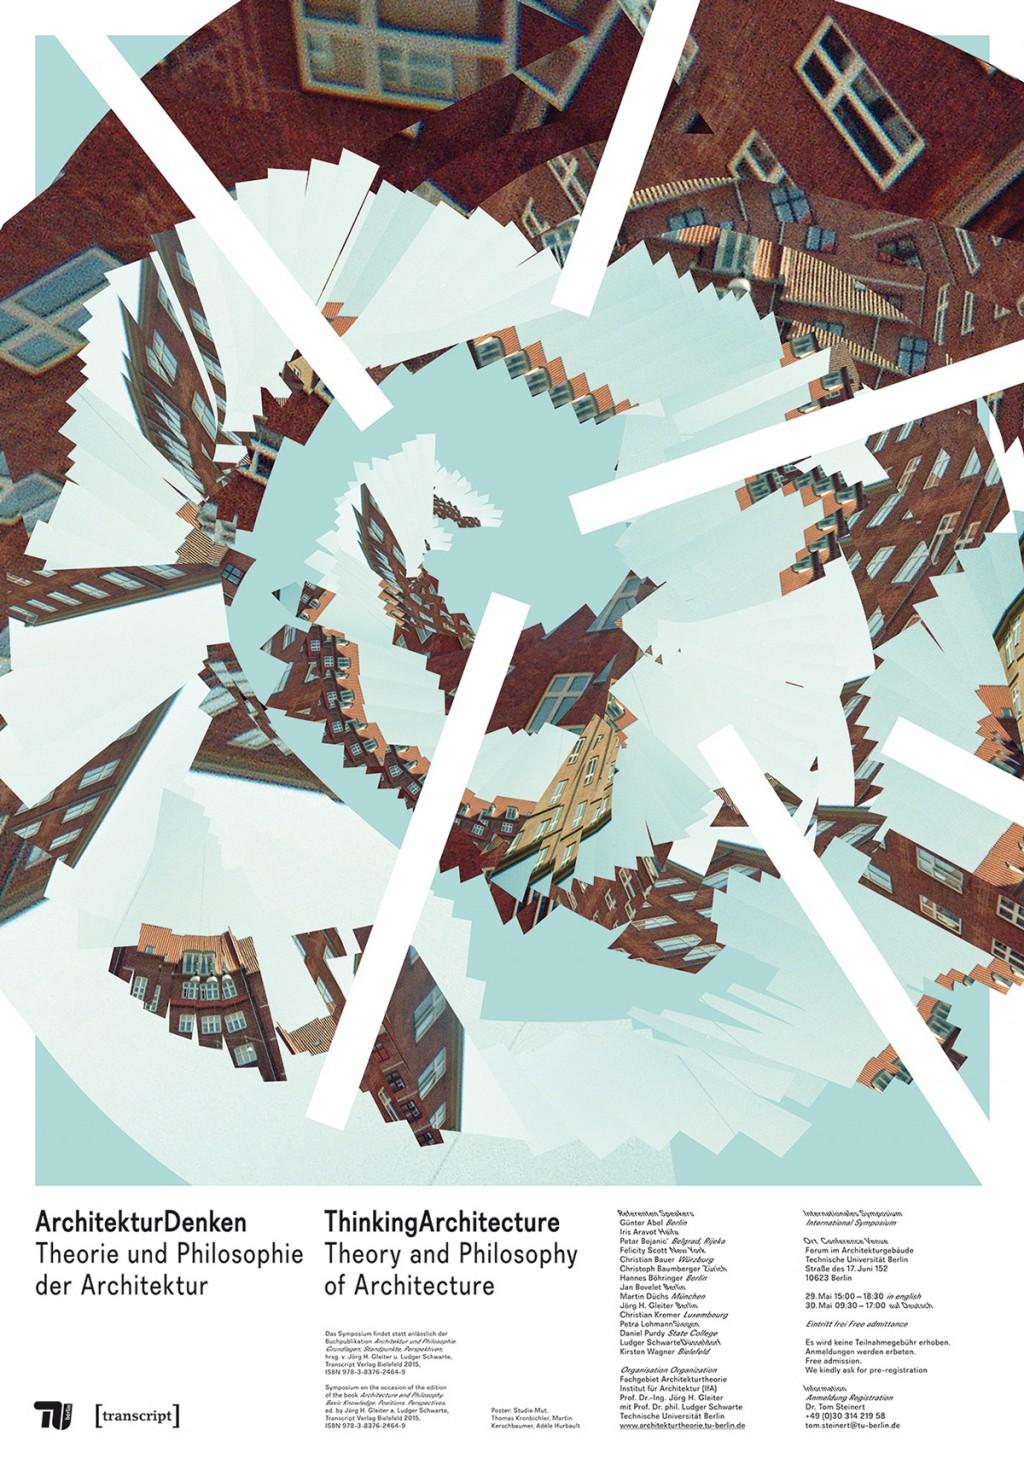 Adèle H. Thinking Architecture